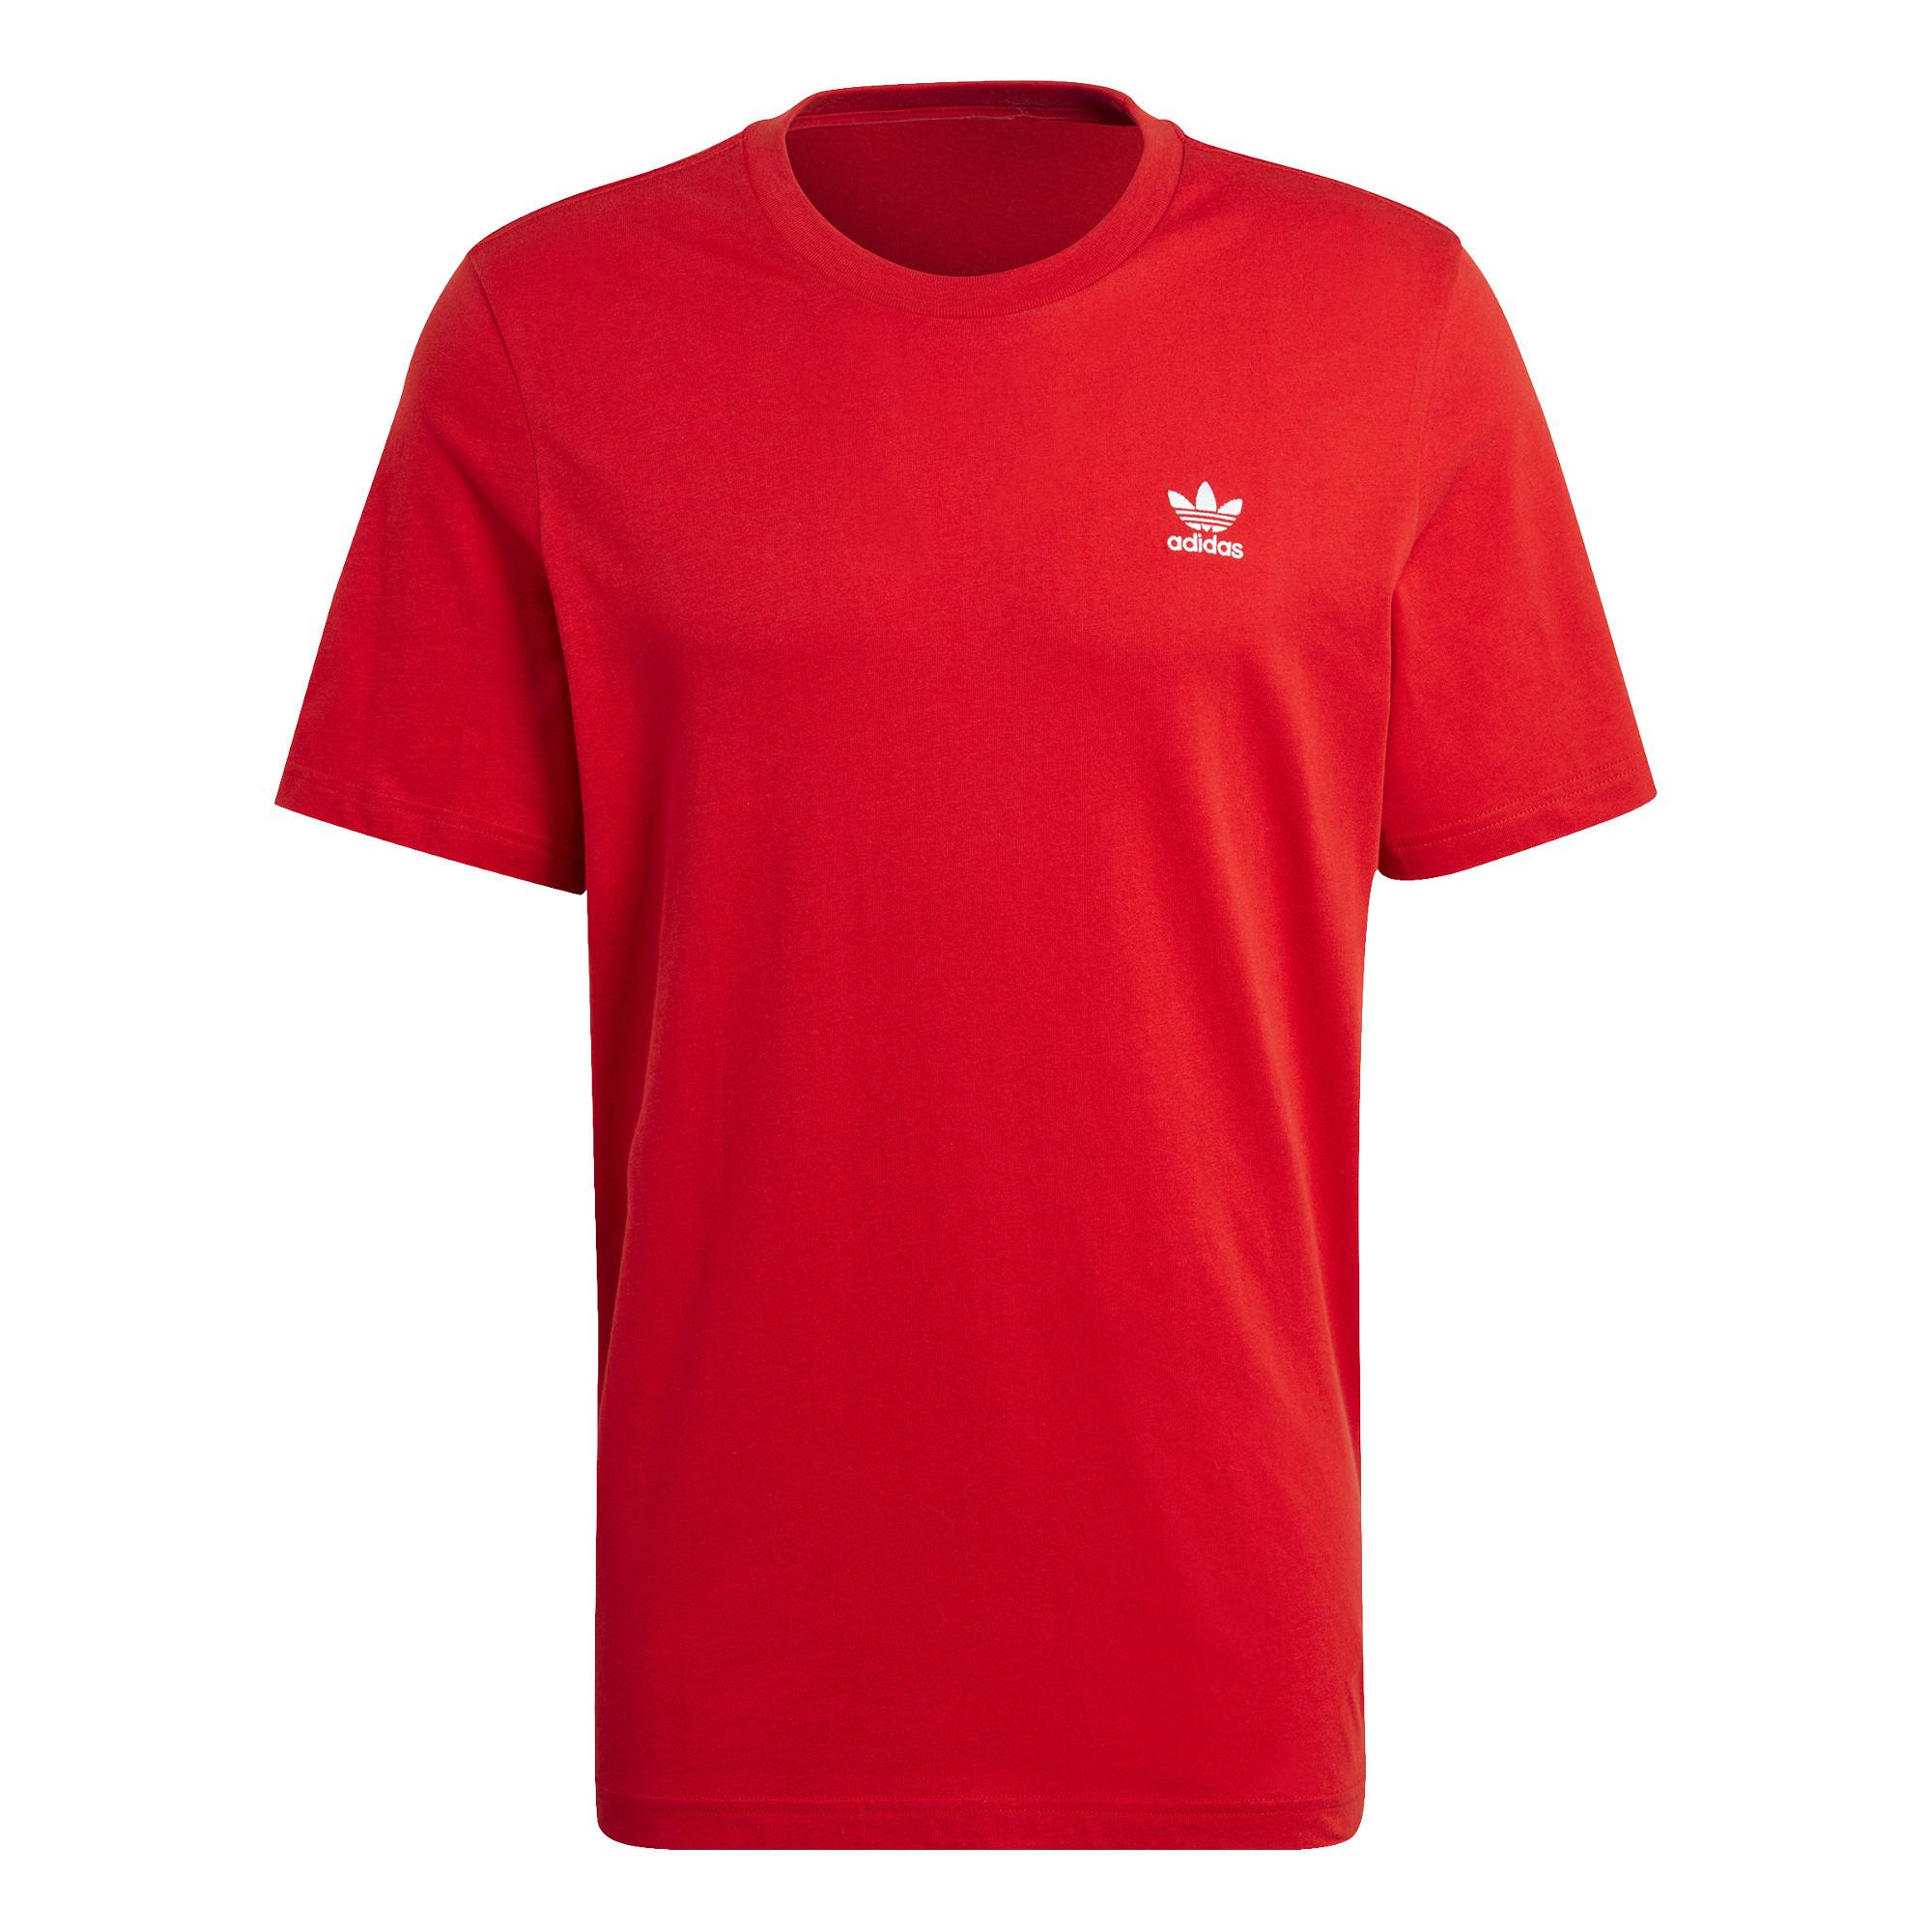 T-shirt loungewear adicolor trefoil essentials, Rosso, large image number 0